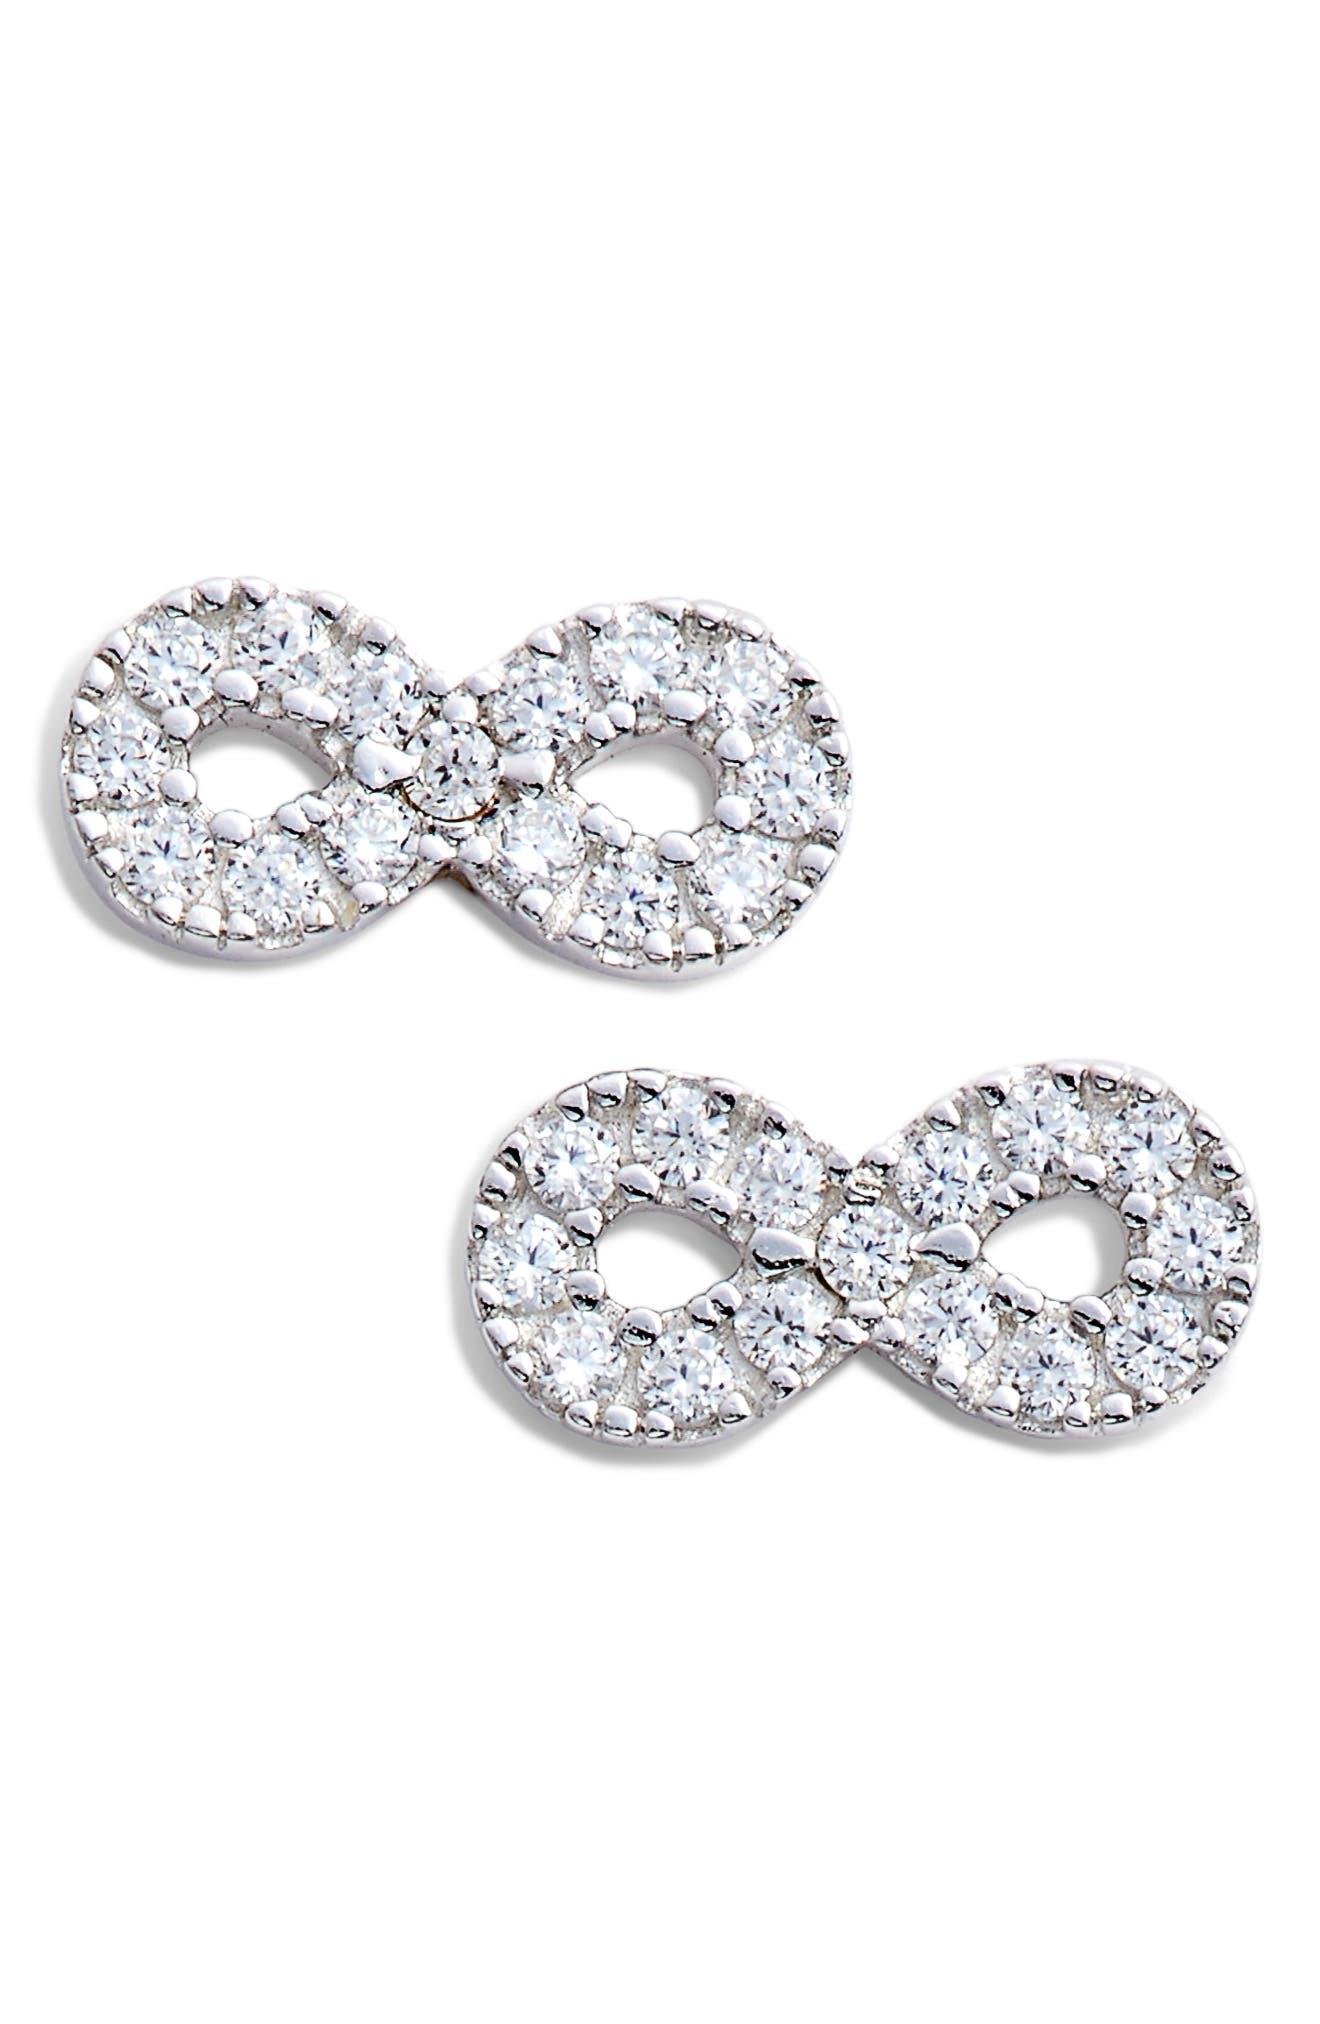 Infinity Stud Earrings,                         Main,                         color, 040